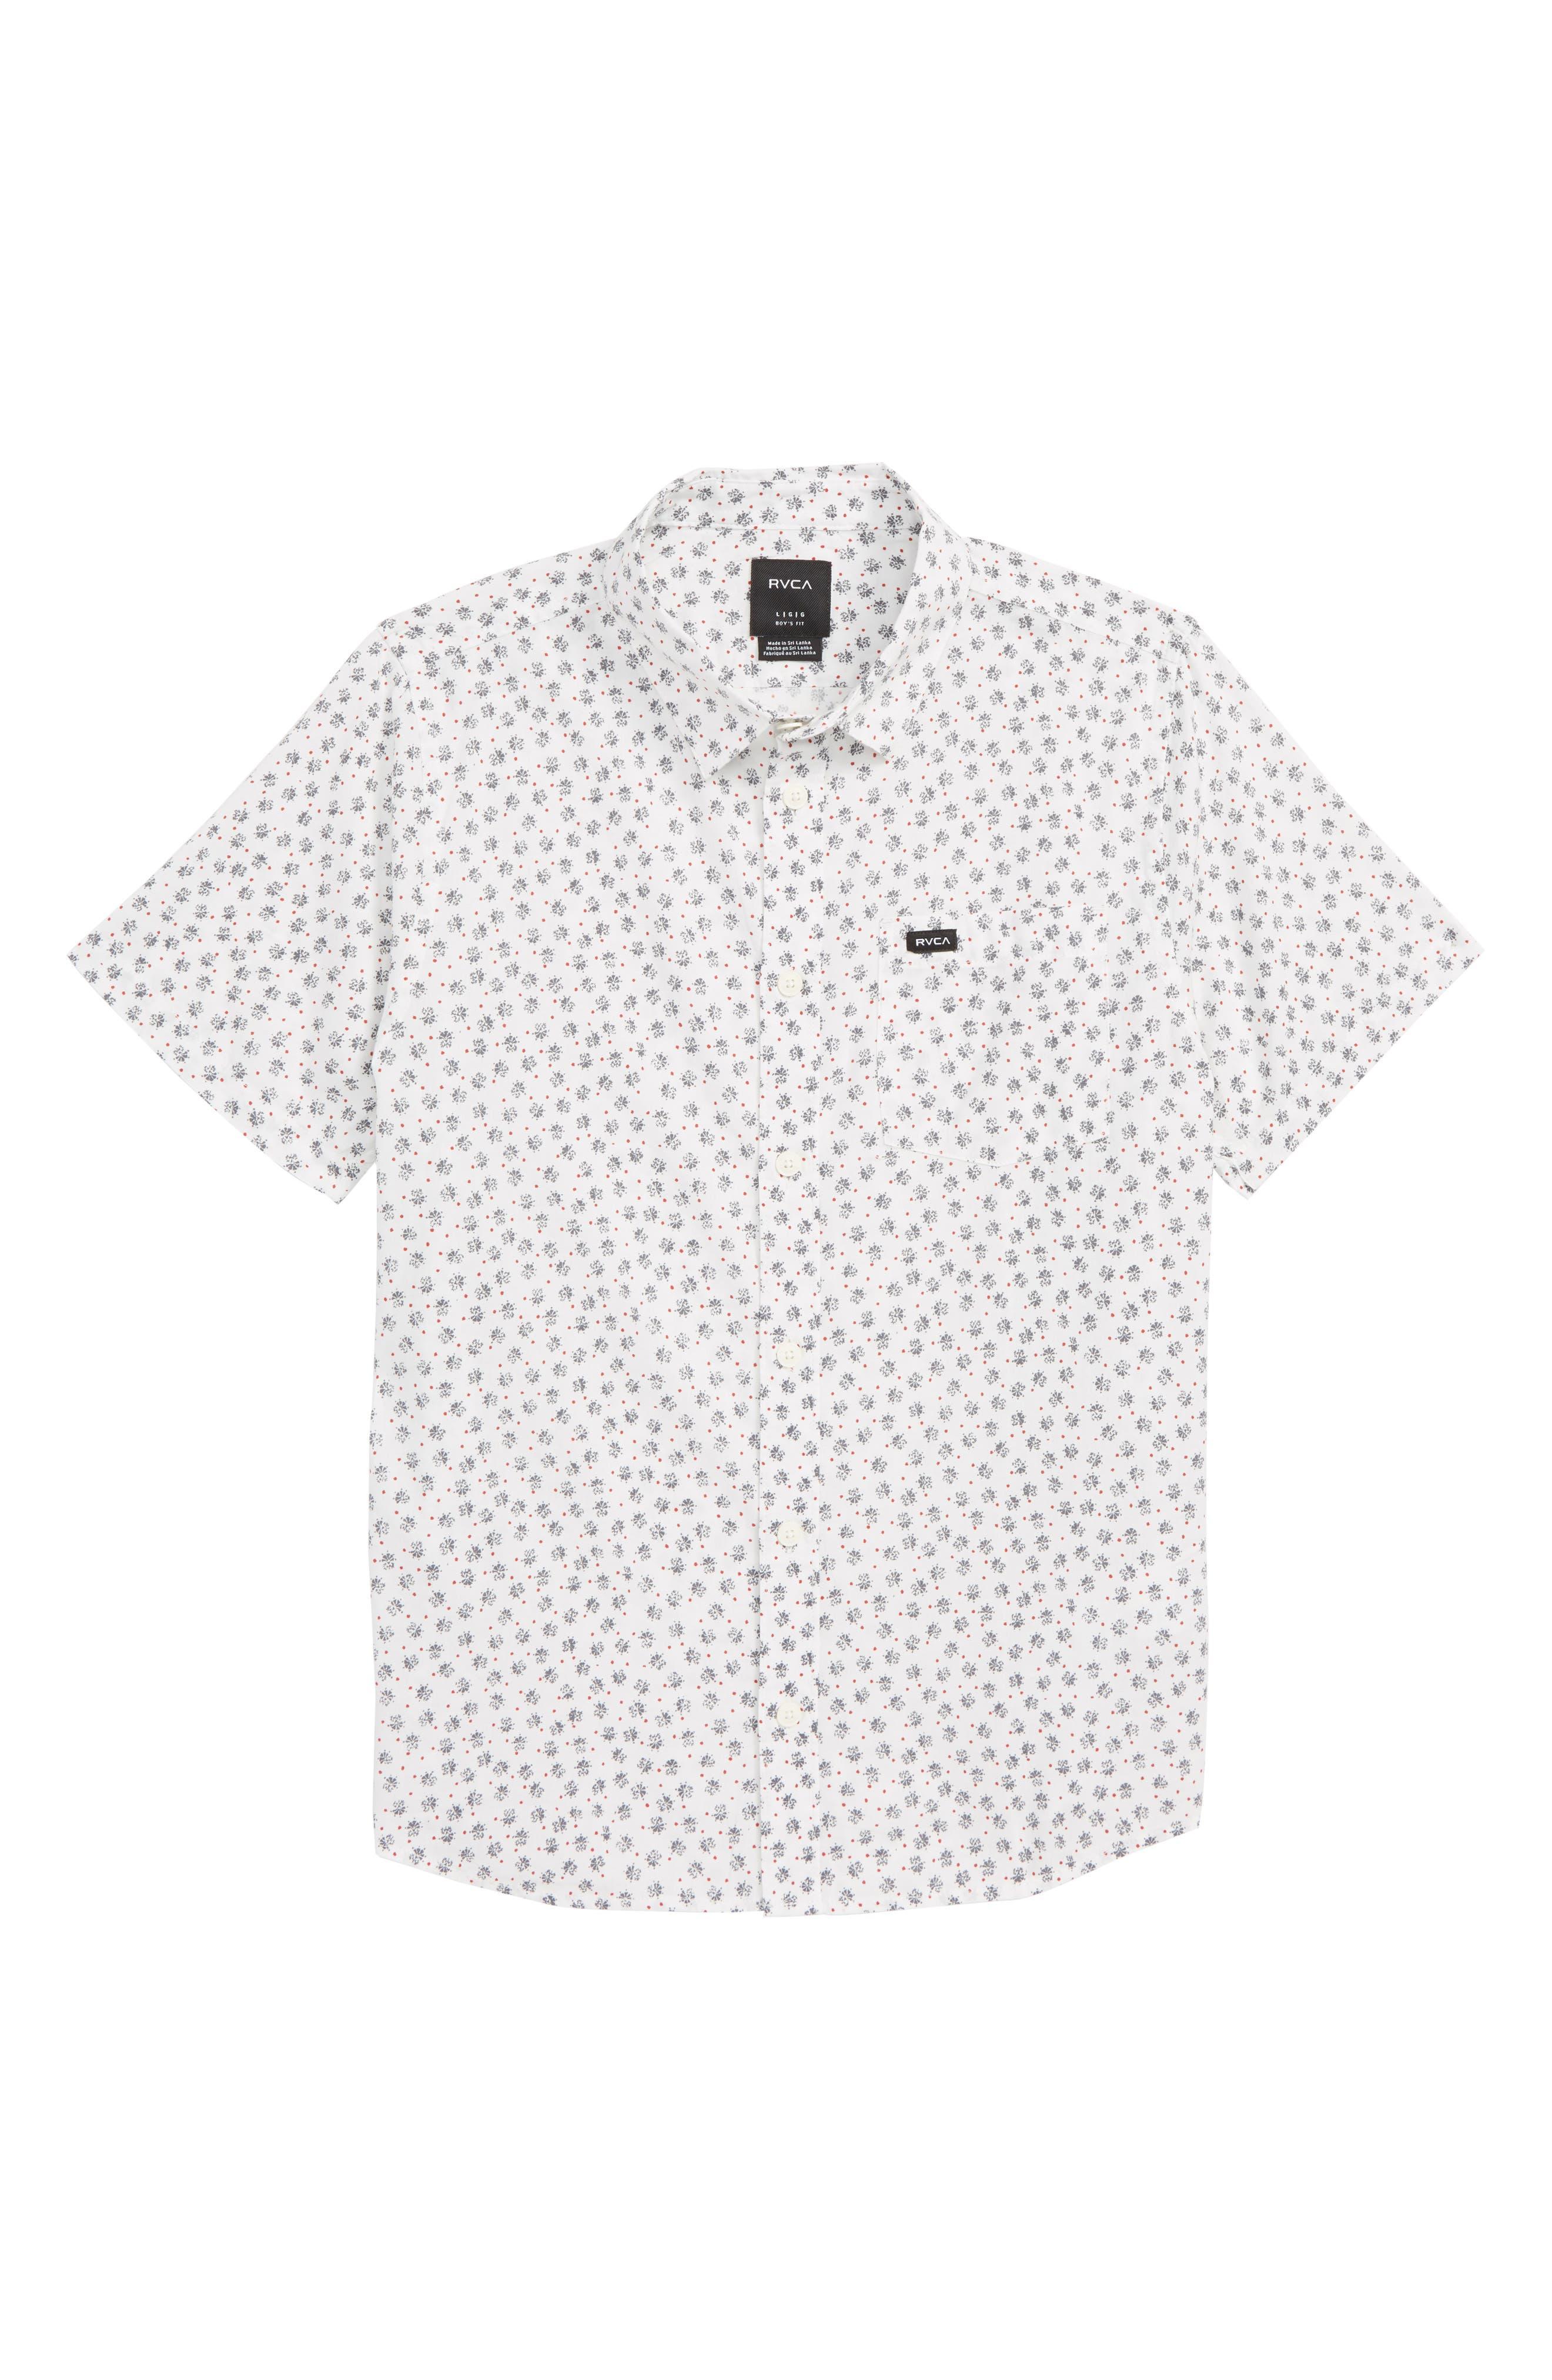 Boys Rvca Ficus Floral Woven Shirt Size XL (1820)  White